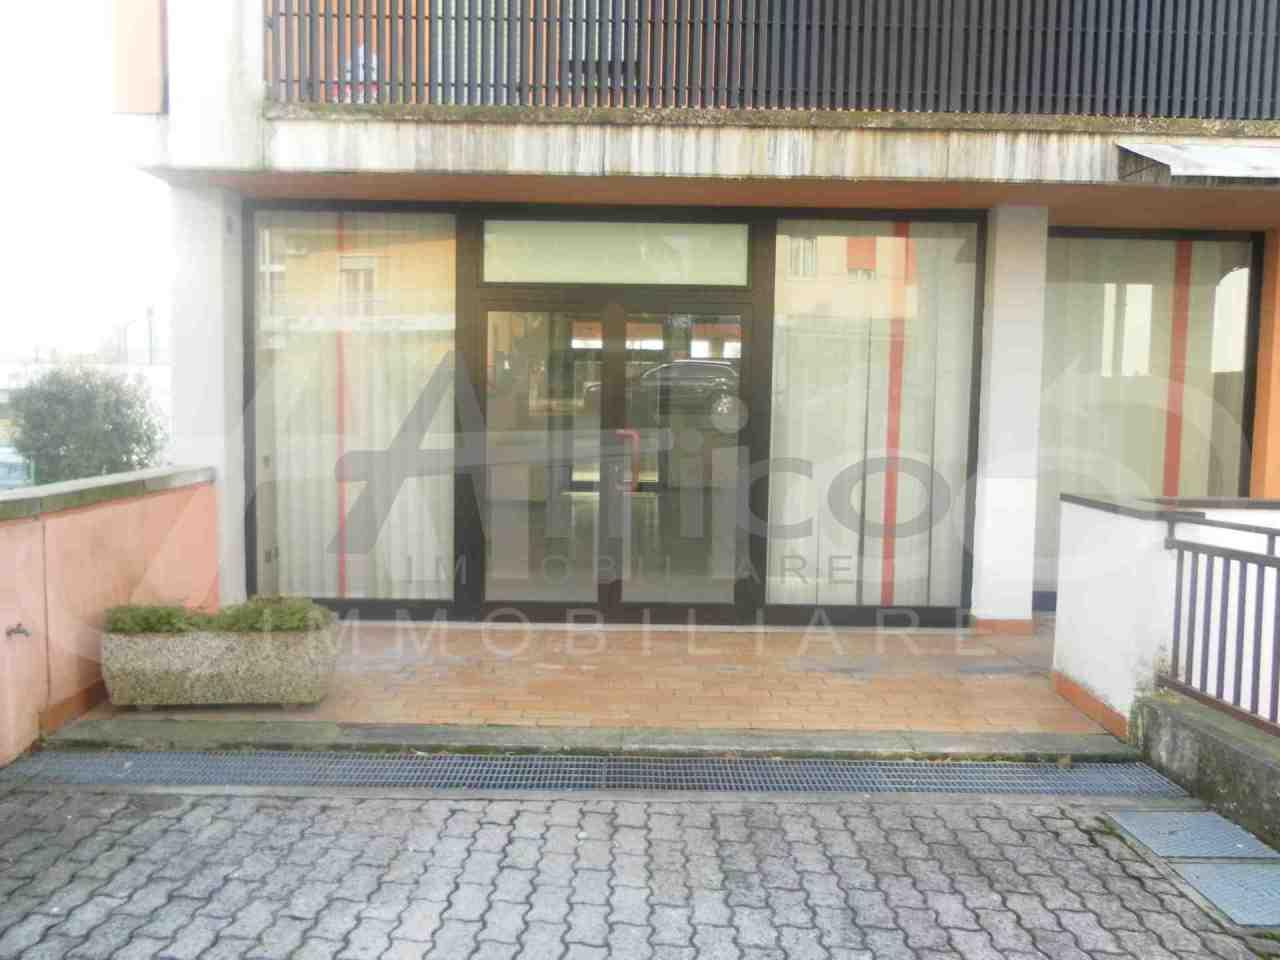 Locale commerciale - 1 Vetrina a Città, Rovigo Rif. 10085287